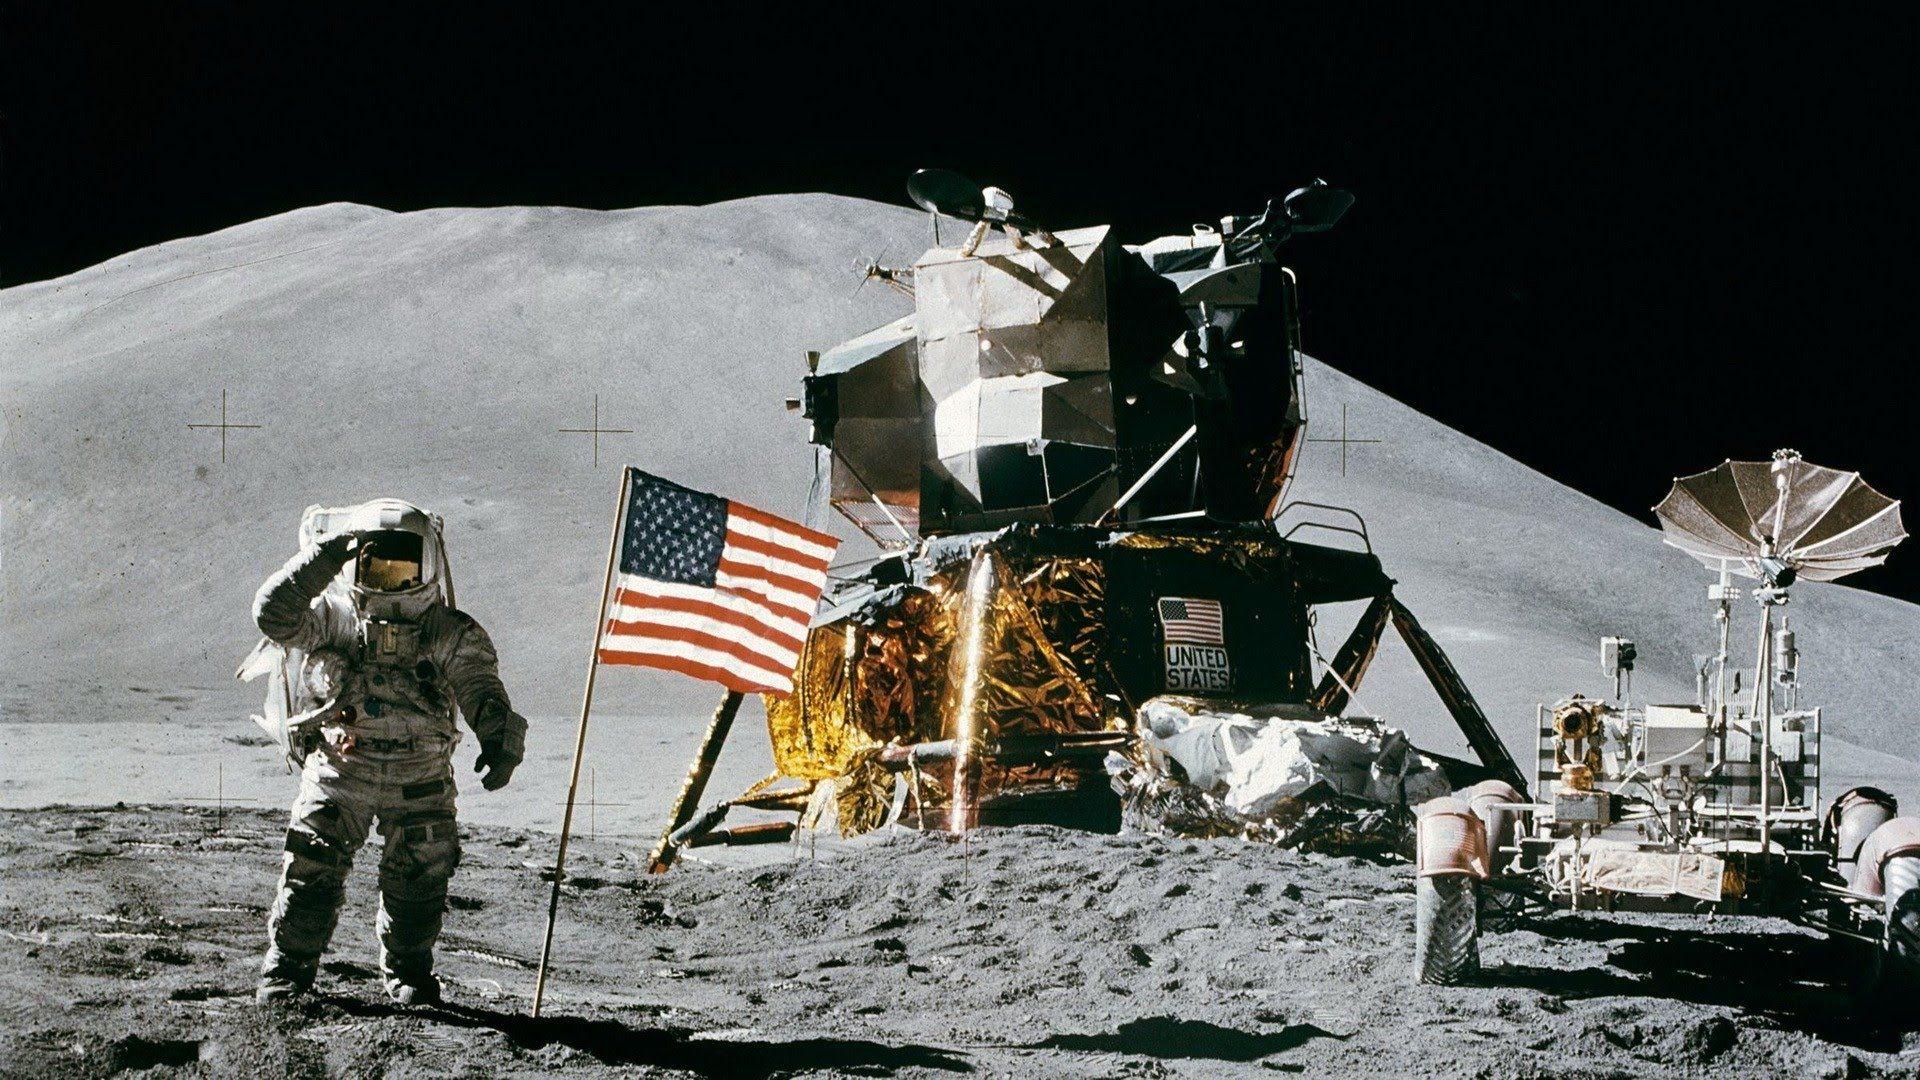 Pin By B B On Mastery Man On The Moon Apollo Moon Landings Us